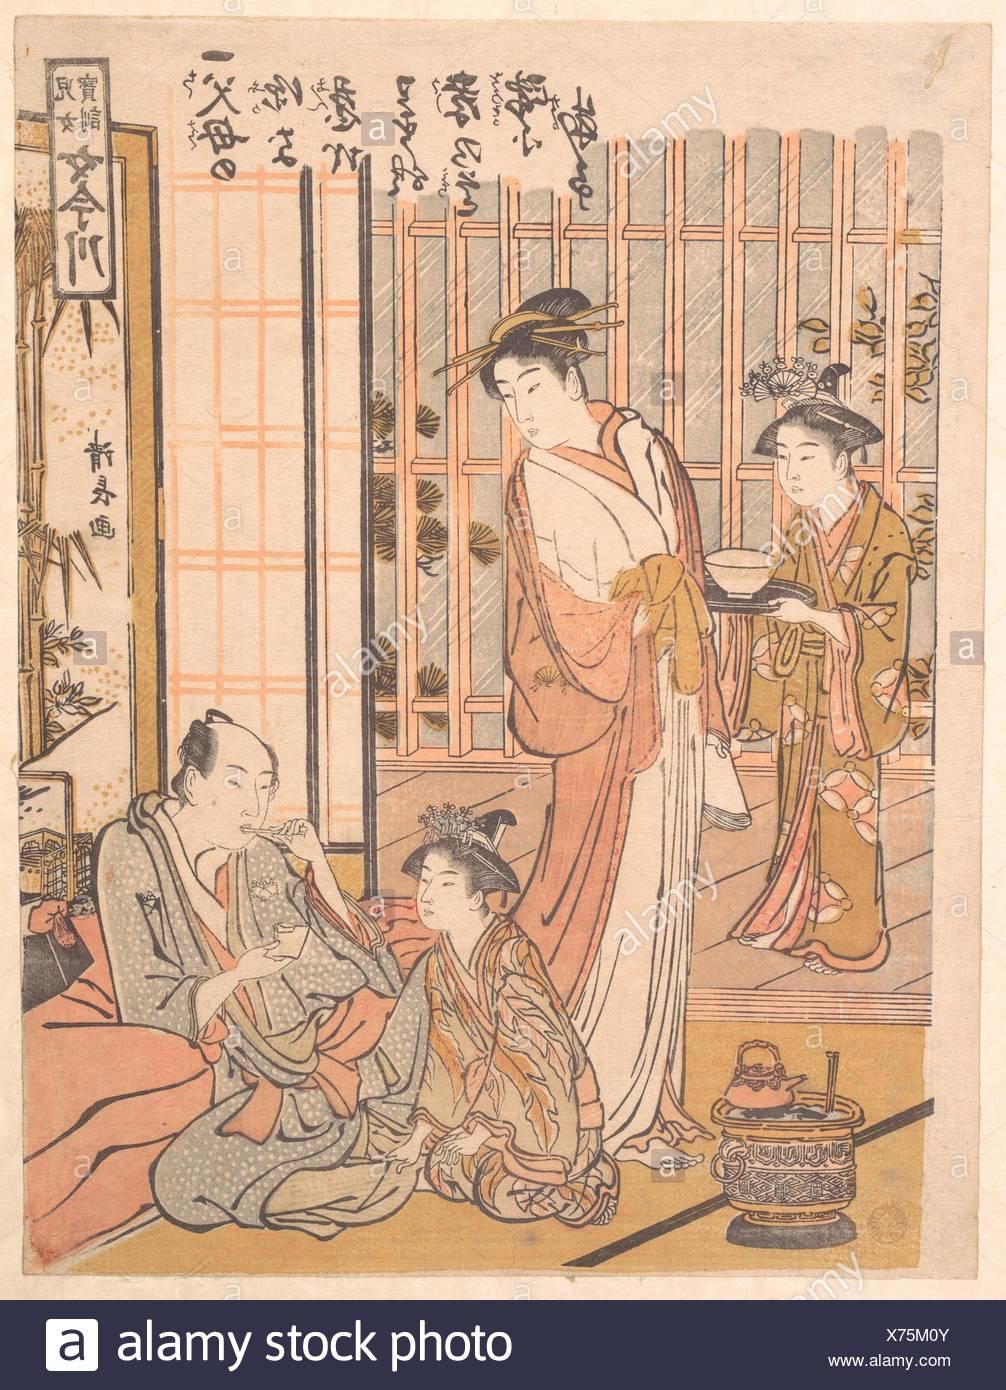 Forgetting Filial Piety. Artist: Torii Kiyonaga (Japanese, 1752-1815); Period: Edo period (1615-1868); Date: ca. 1781; Culture: Japan; Medium: Stock Photo